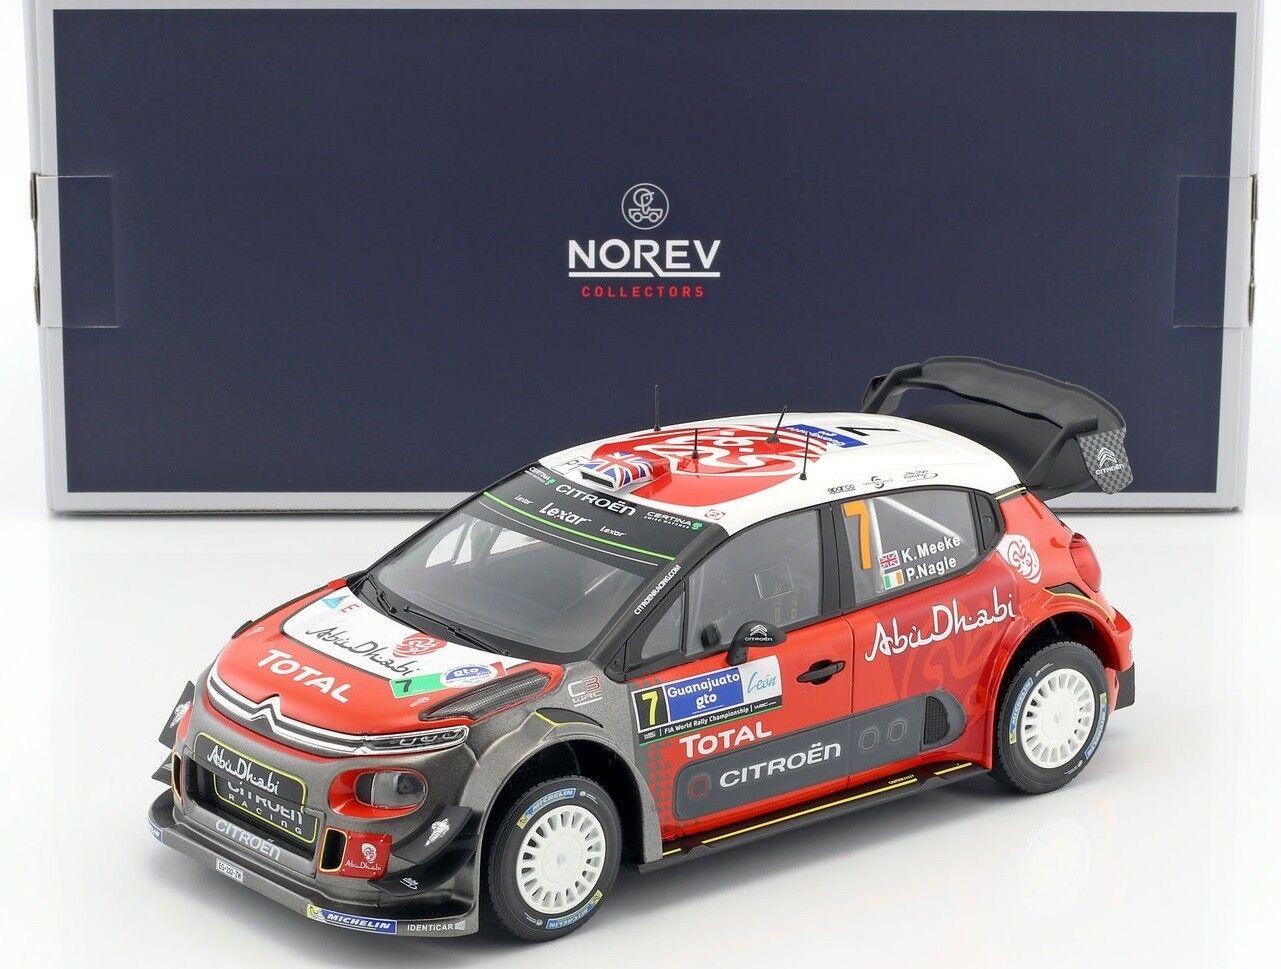 NOREV181632 - Voiture de rallye CITROEN C3 WRC N°7 Winner Mexico de 2017 équipag